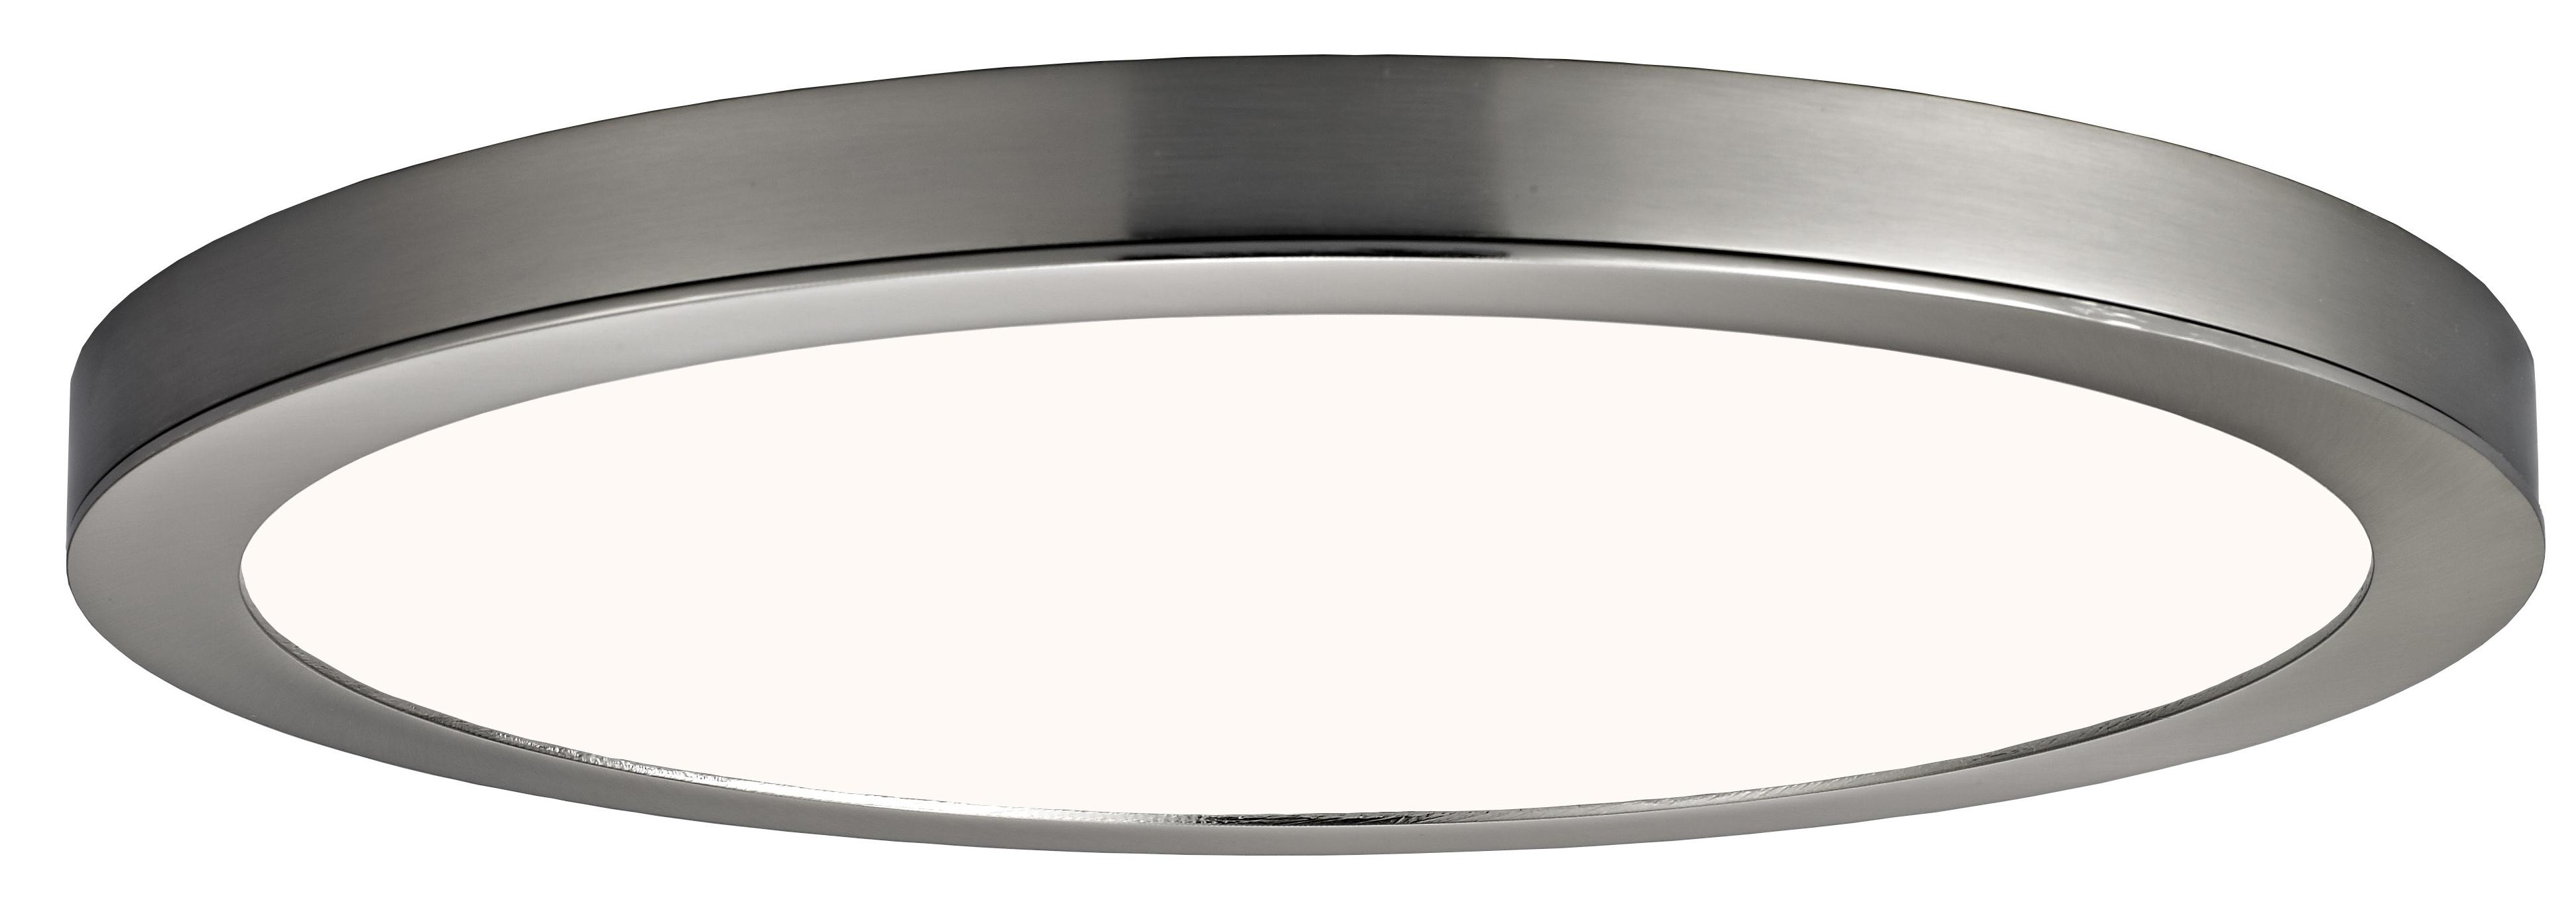 luminaire plafonnier rond led sm15dl bn c. Black Bedroom Furniture Sets. Home Design Ideas